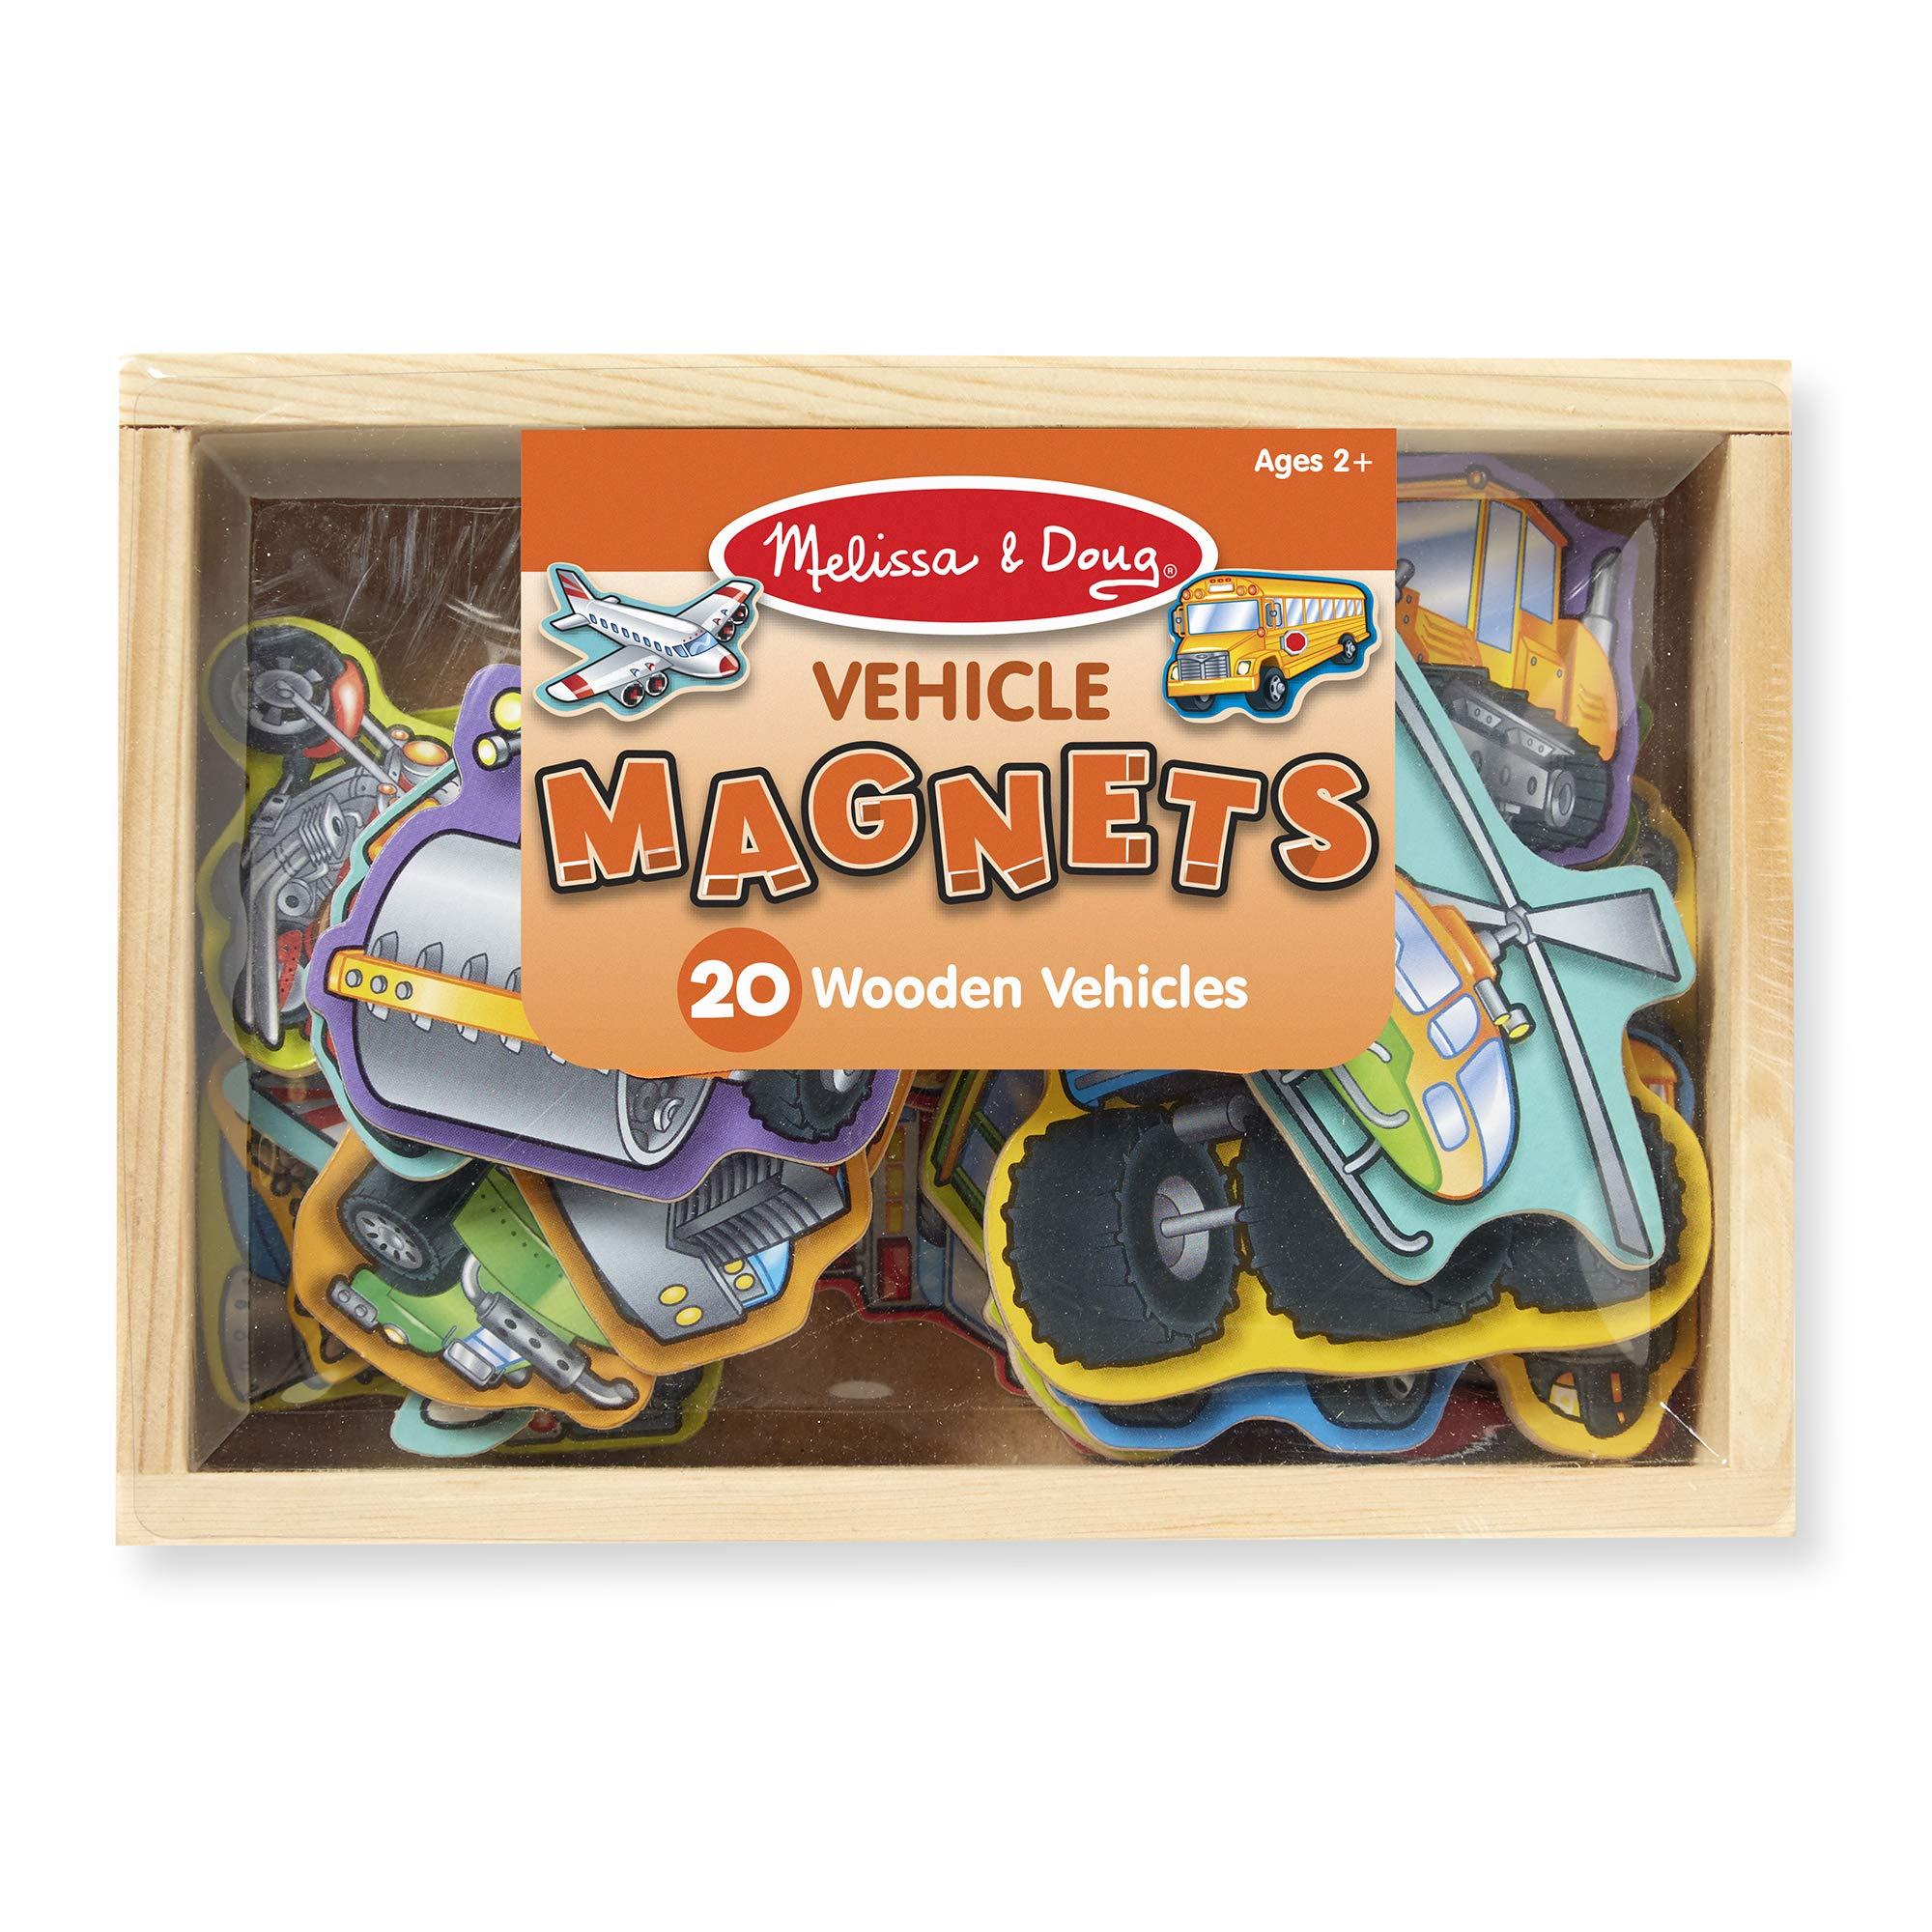 Melissa & Doug Wooden Vehicle Magnets in a Box (20 pcs) by Melissa & Doug